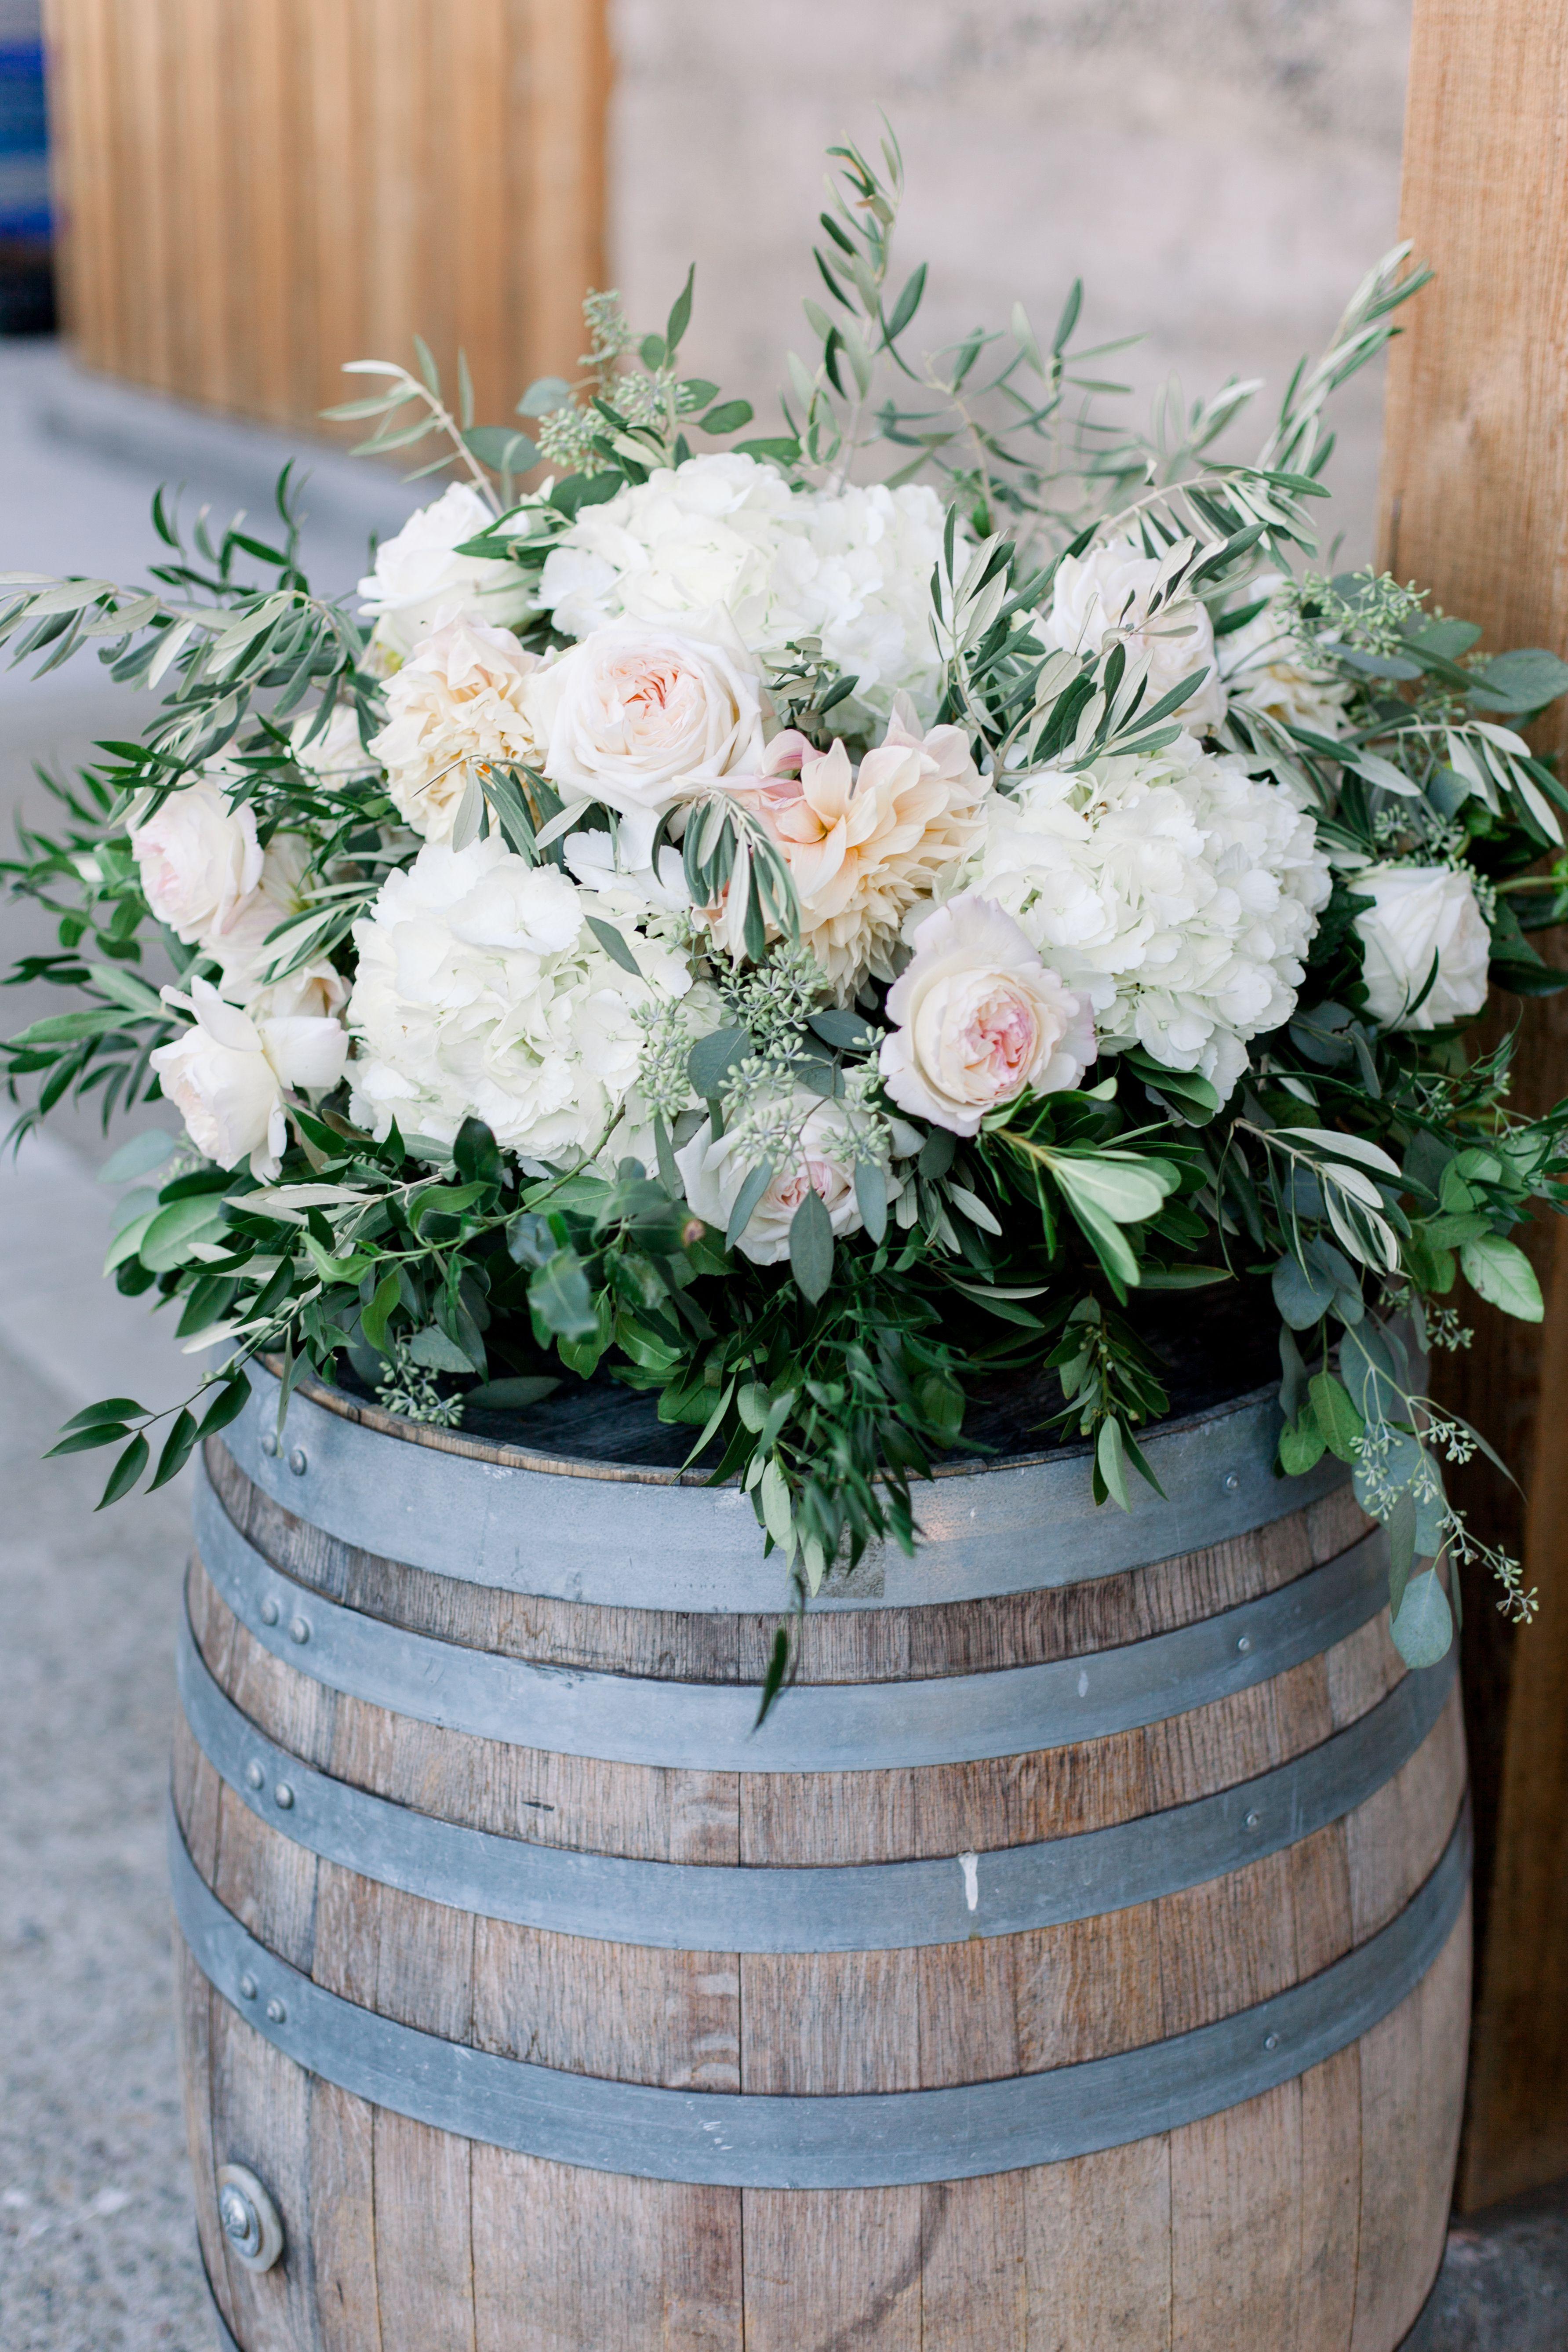 Unsymmetrical barrel arrangement with lots of greenery